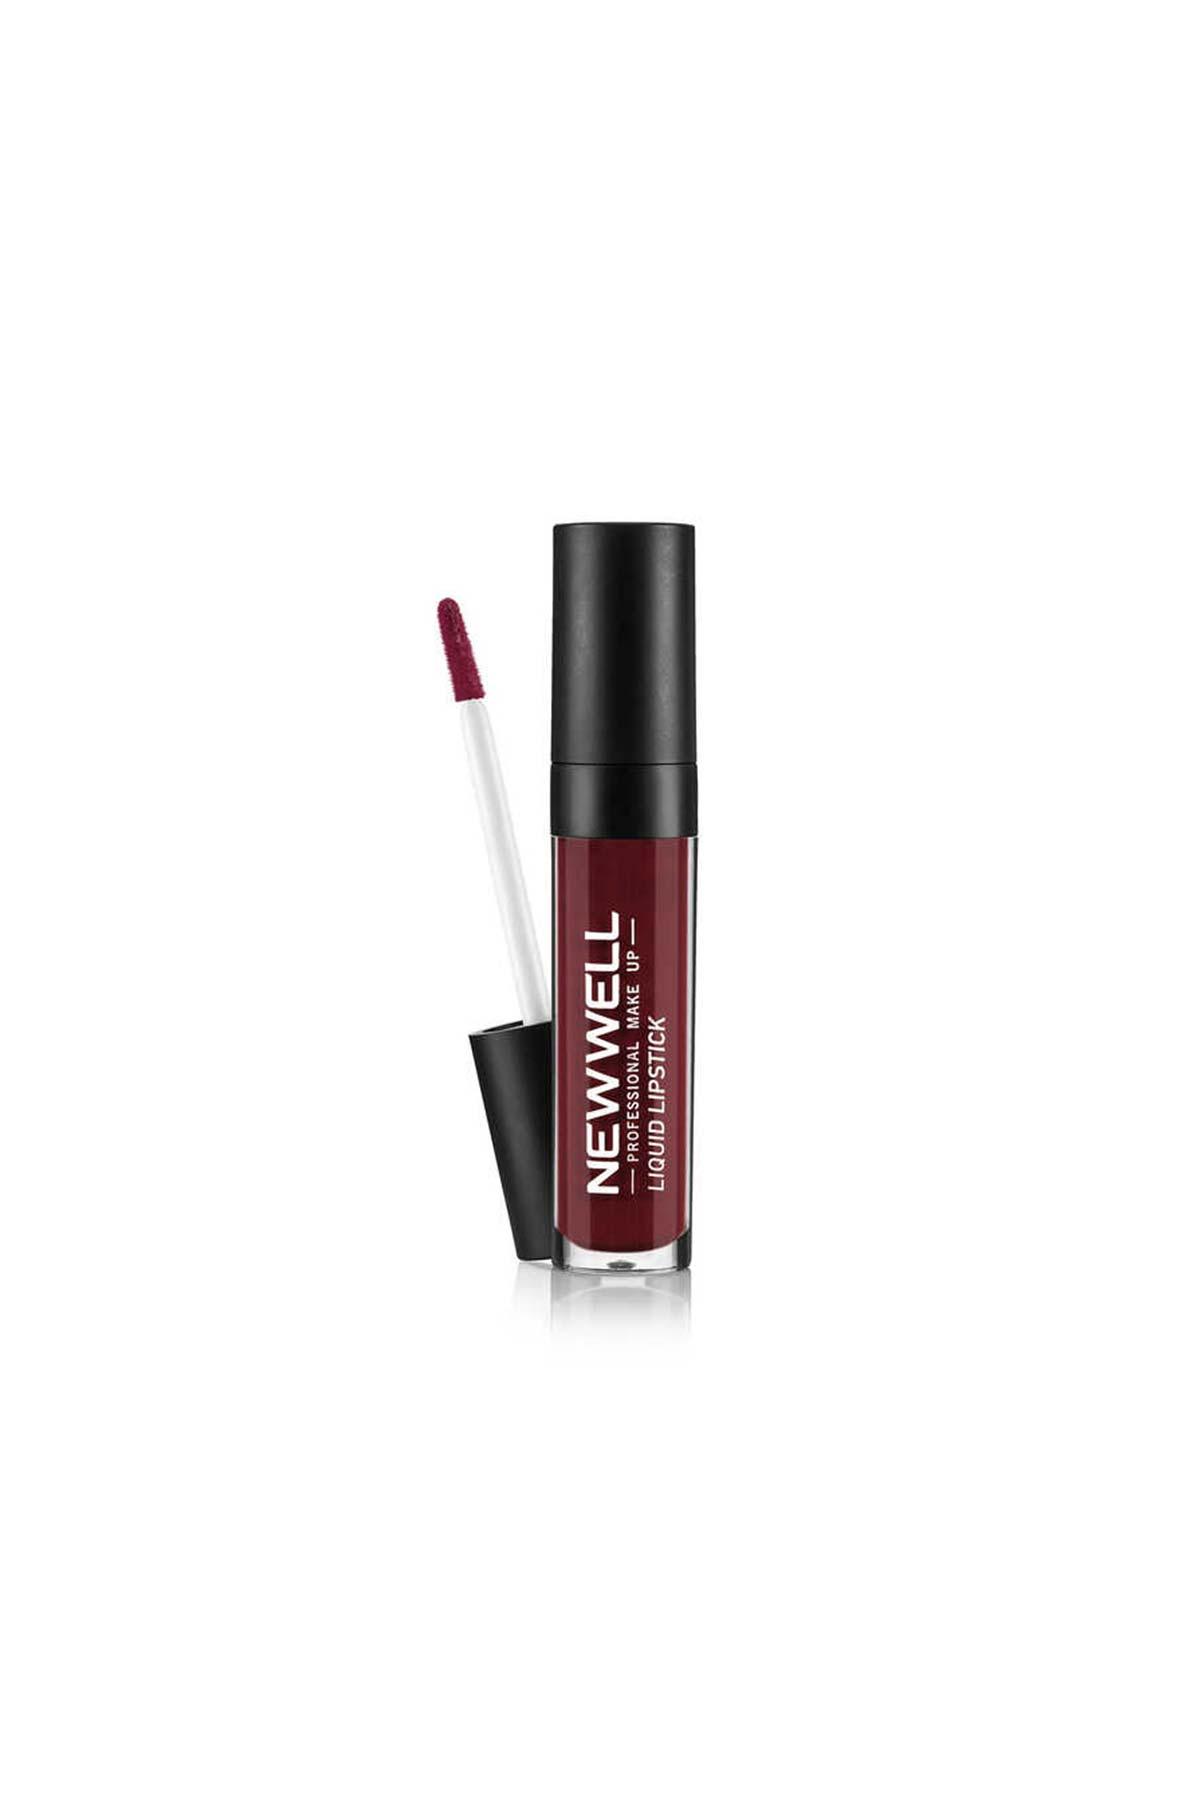 Liquid Lipgloss - 219 -Ruj - Lipstick